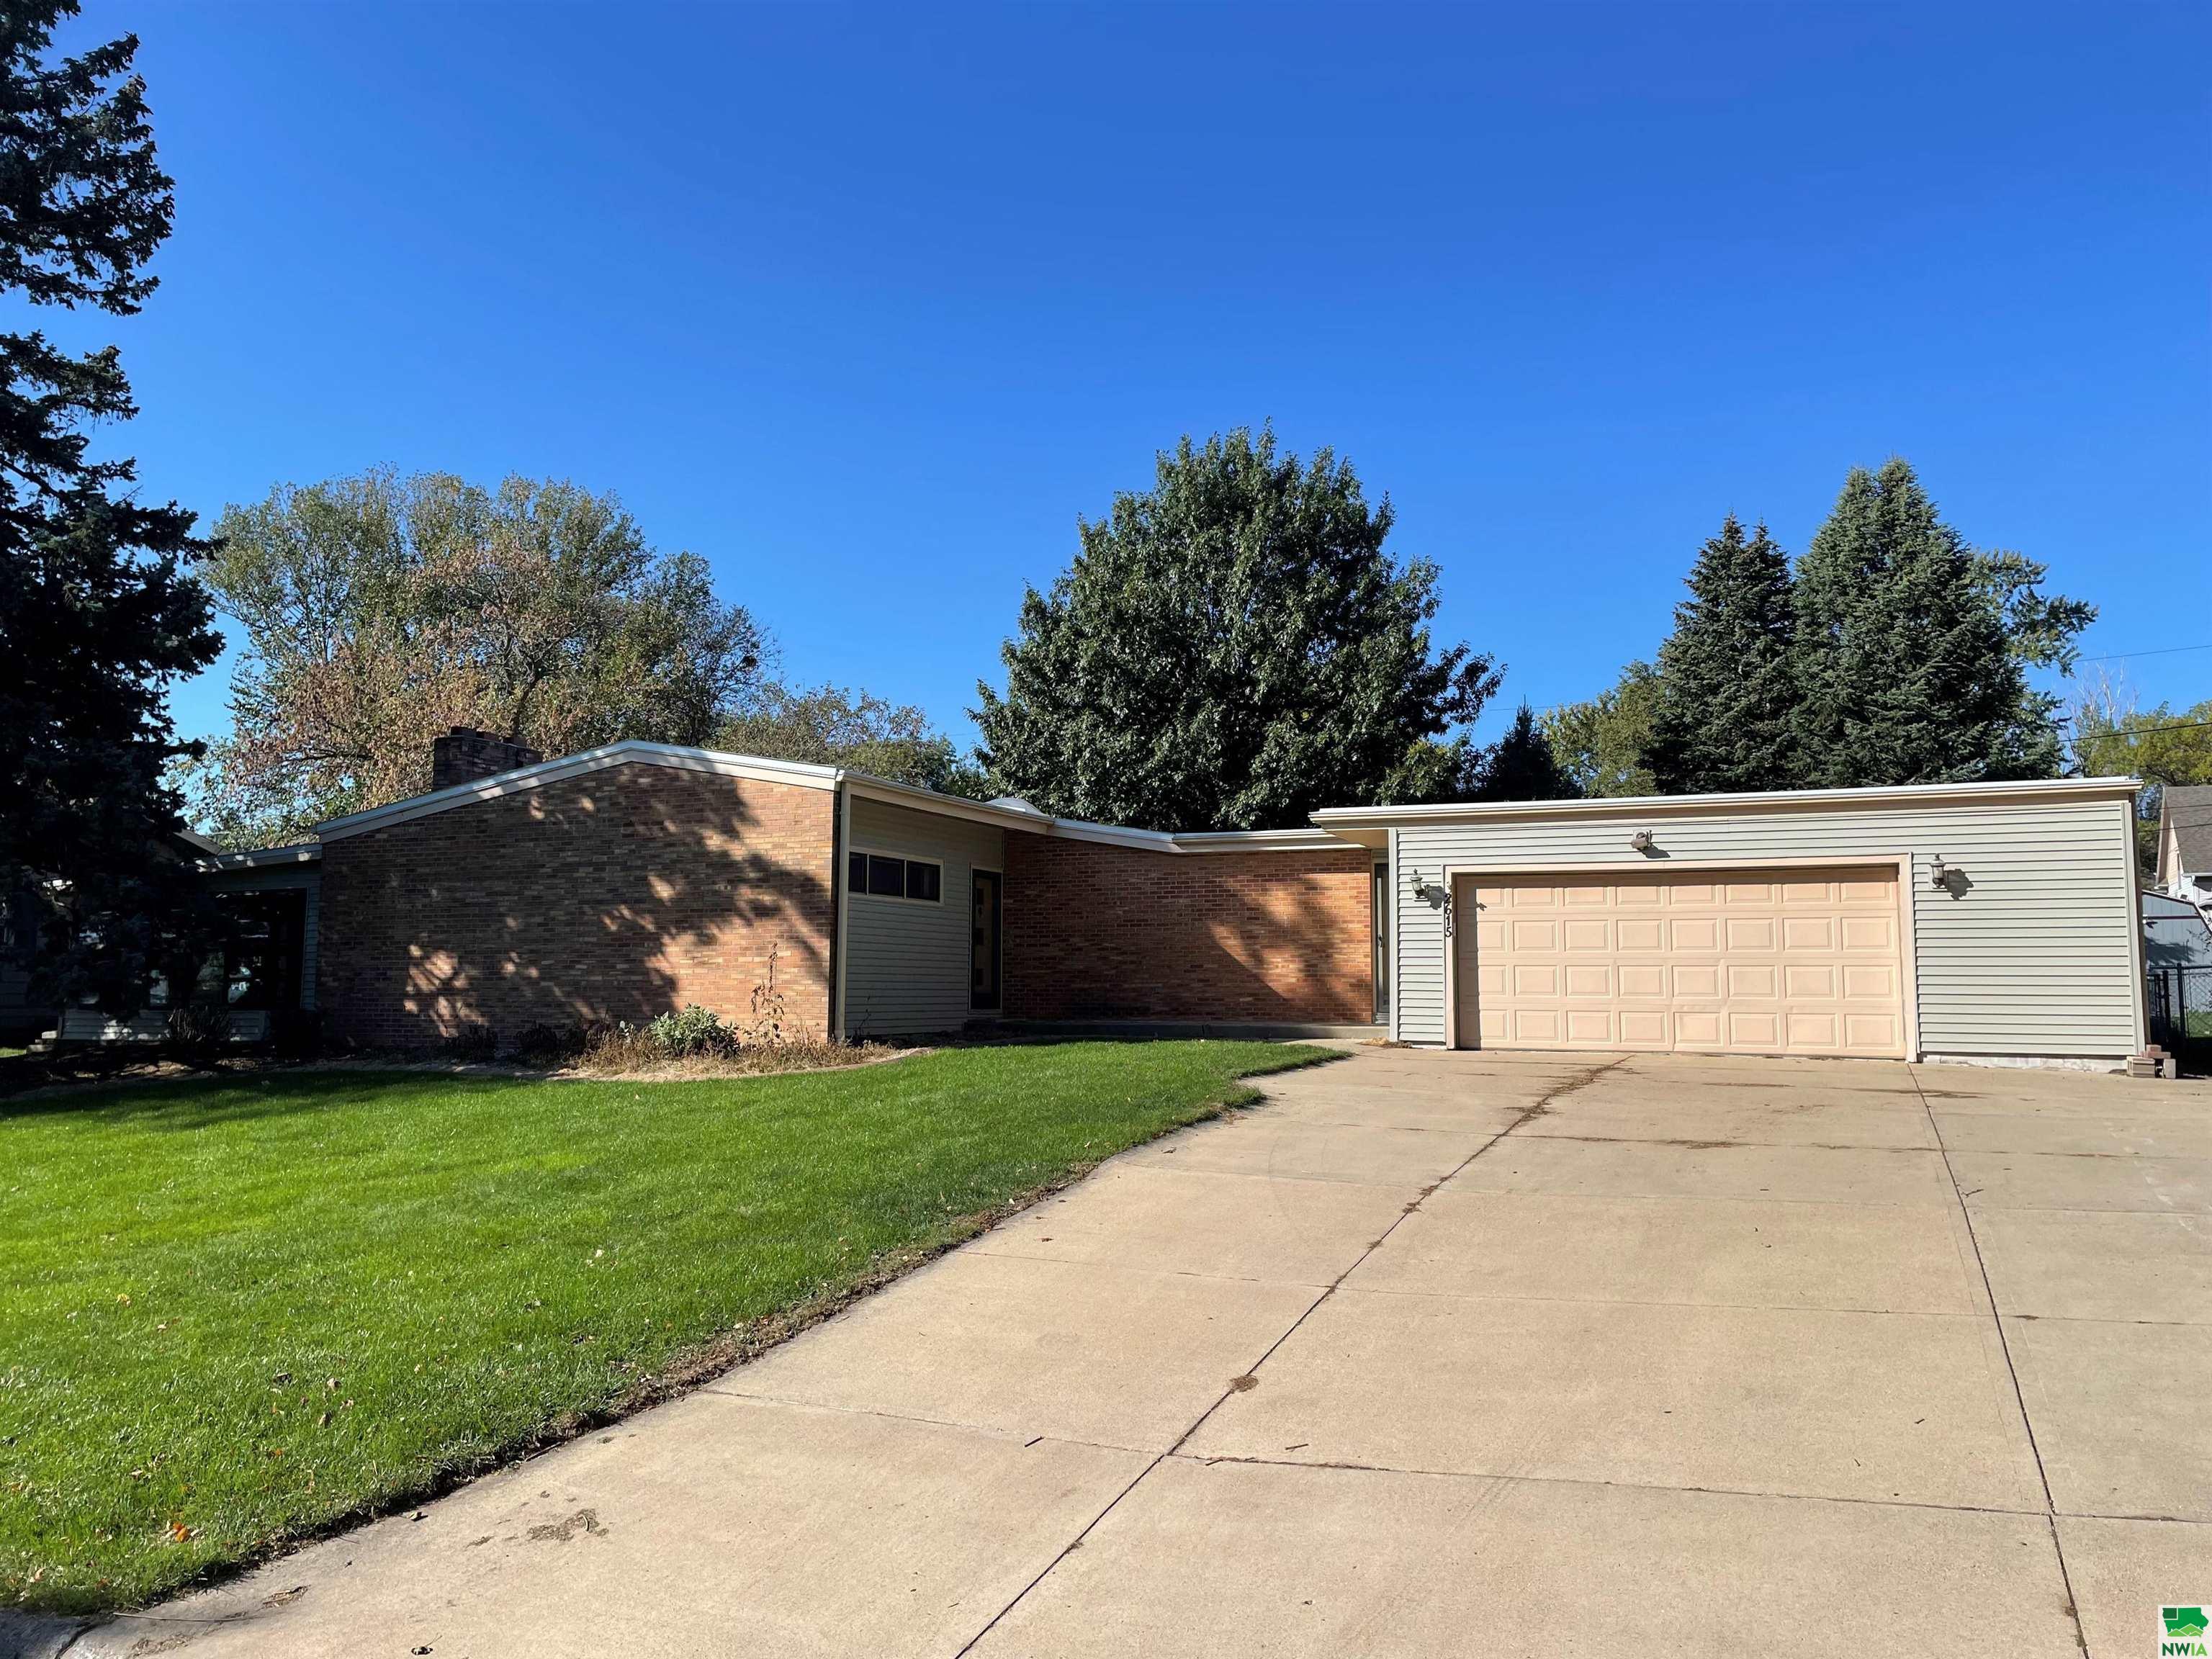 2615 Maple S, Sioux City, Iowa 51106